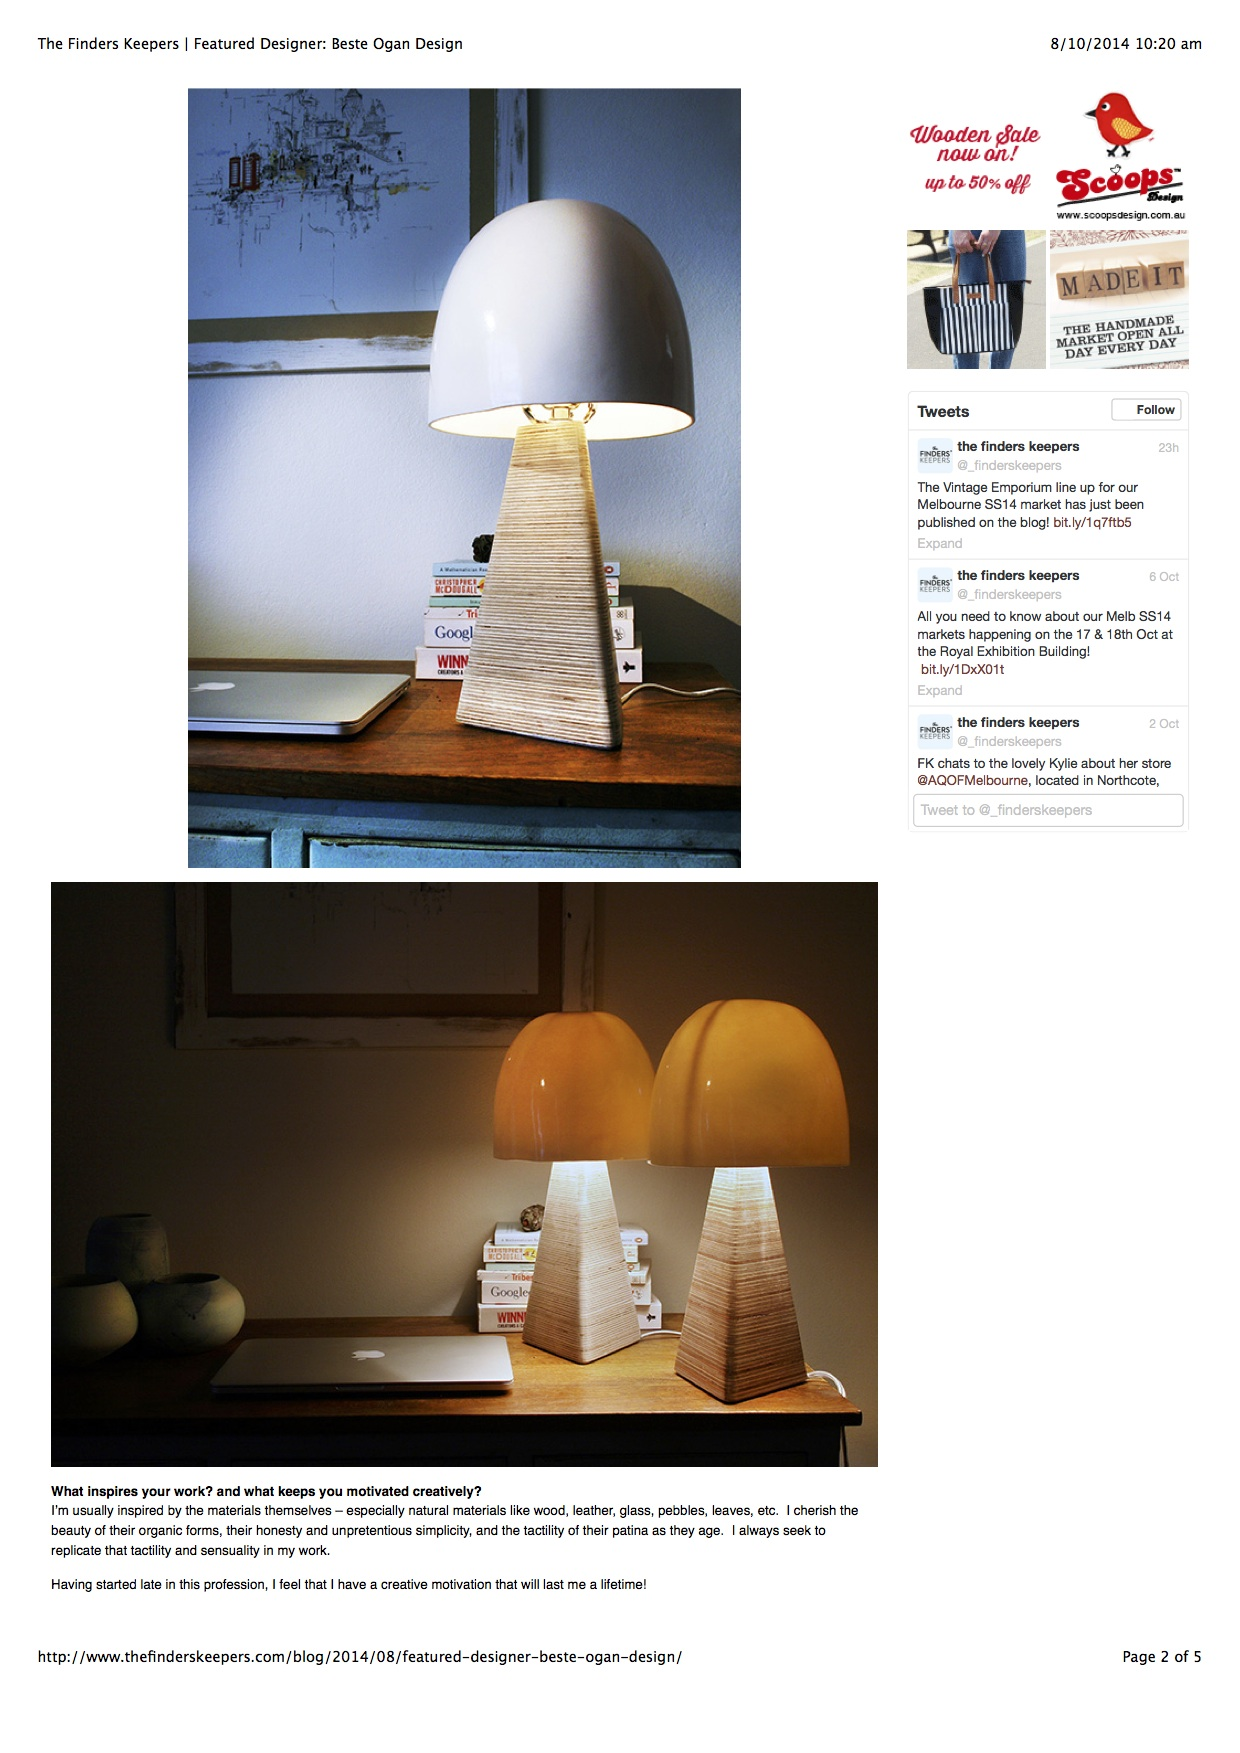 The Finders Keepers | Featured Designer: Beste Ogan Design2.jpg